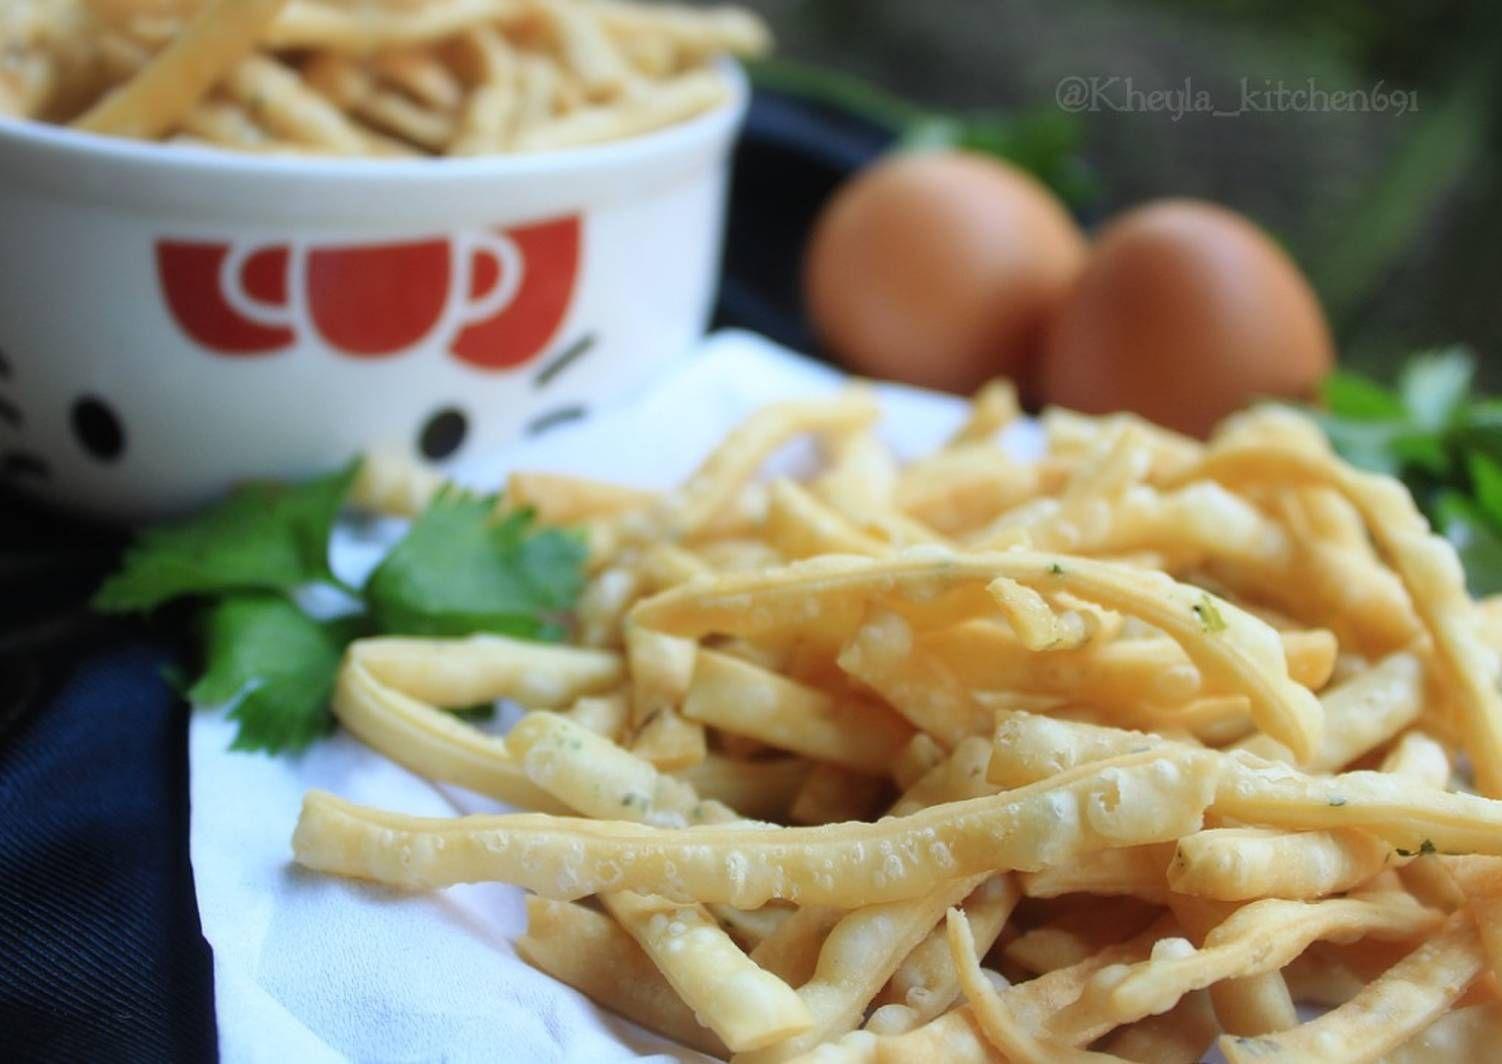 Resep Ladrang Stik Bawang Renyah Iritzzz Tips Oleh Kheyla S Kitchen Resep Resep Makanan Sehat Resep Makanan Sehat